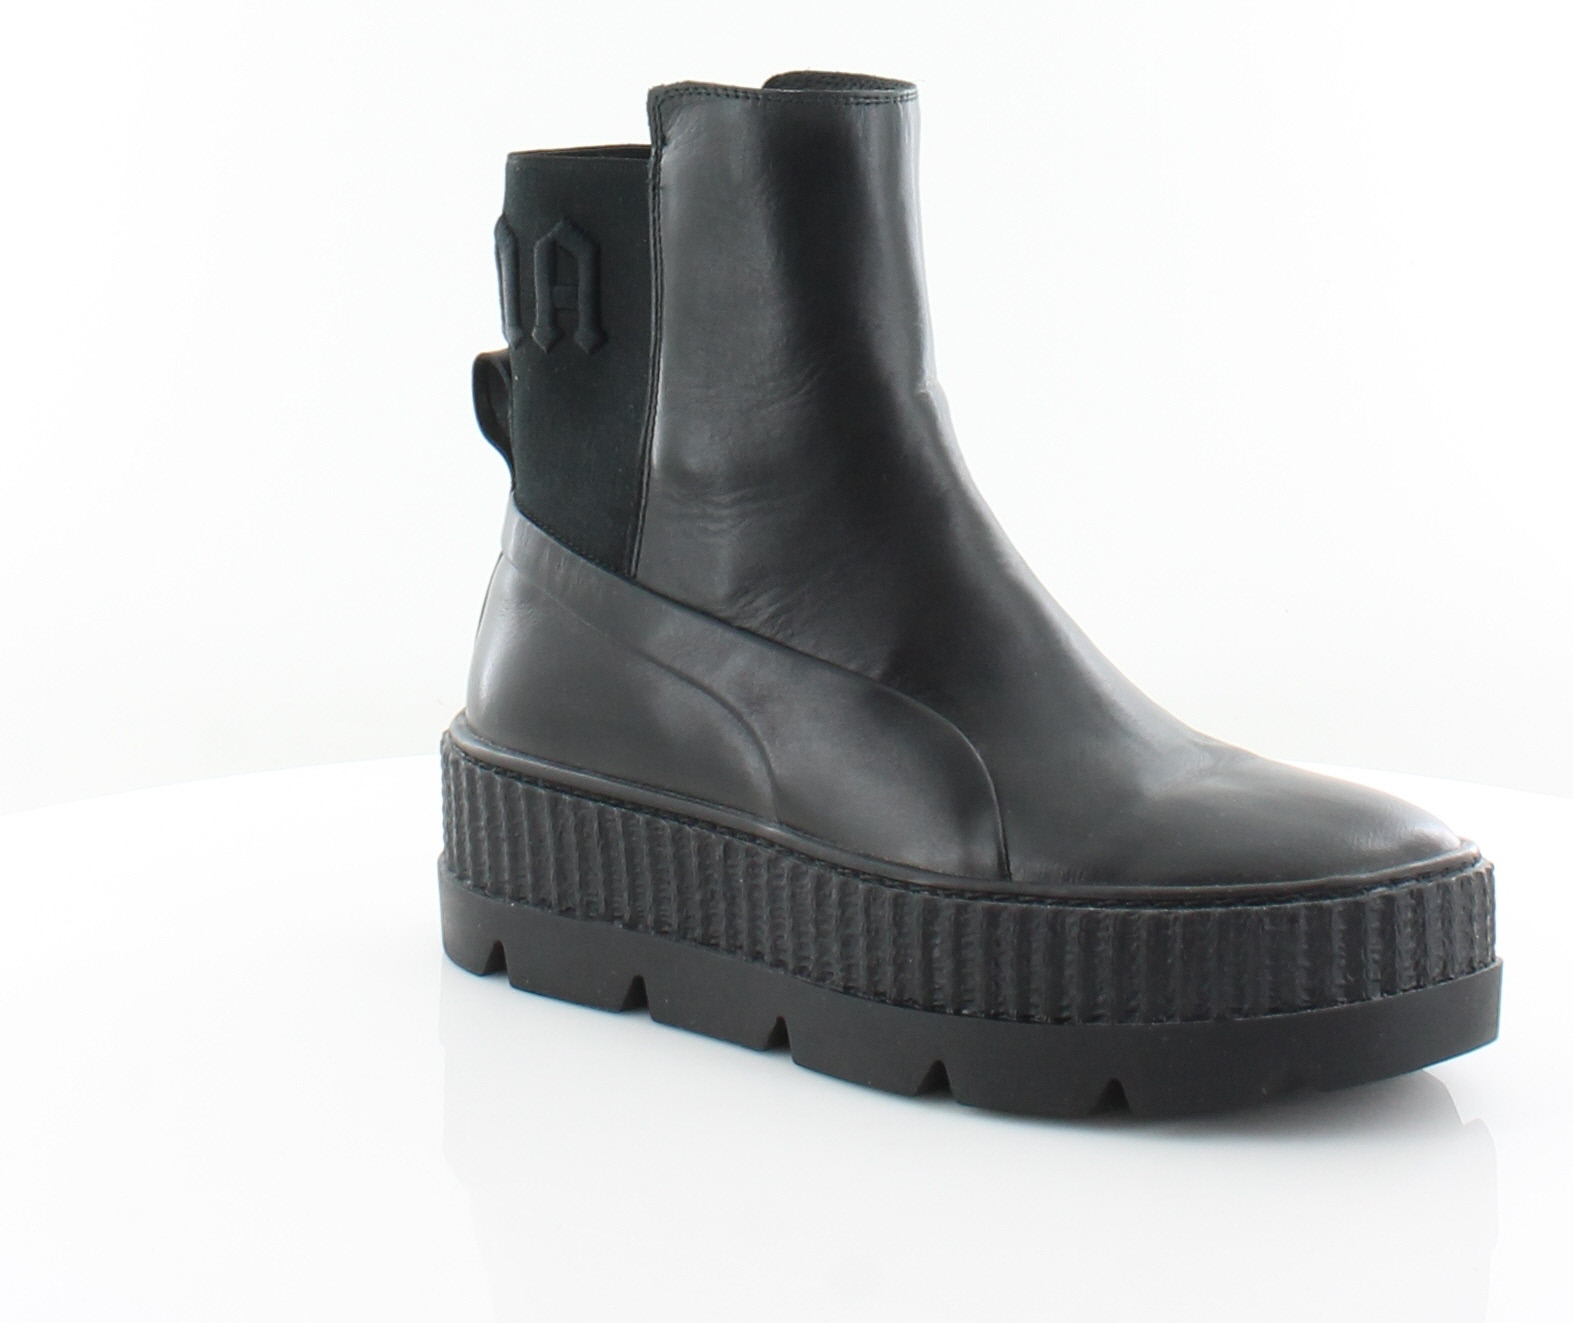 super cute 91b80 58782 Details about Fenty Puma x Rihanna Chelsea Sneaker Black Womens Shoes 7 M  Boots MSRP $220